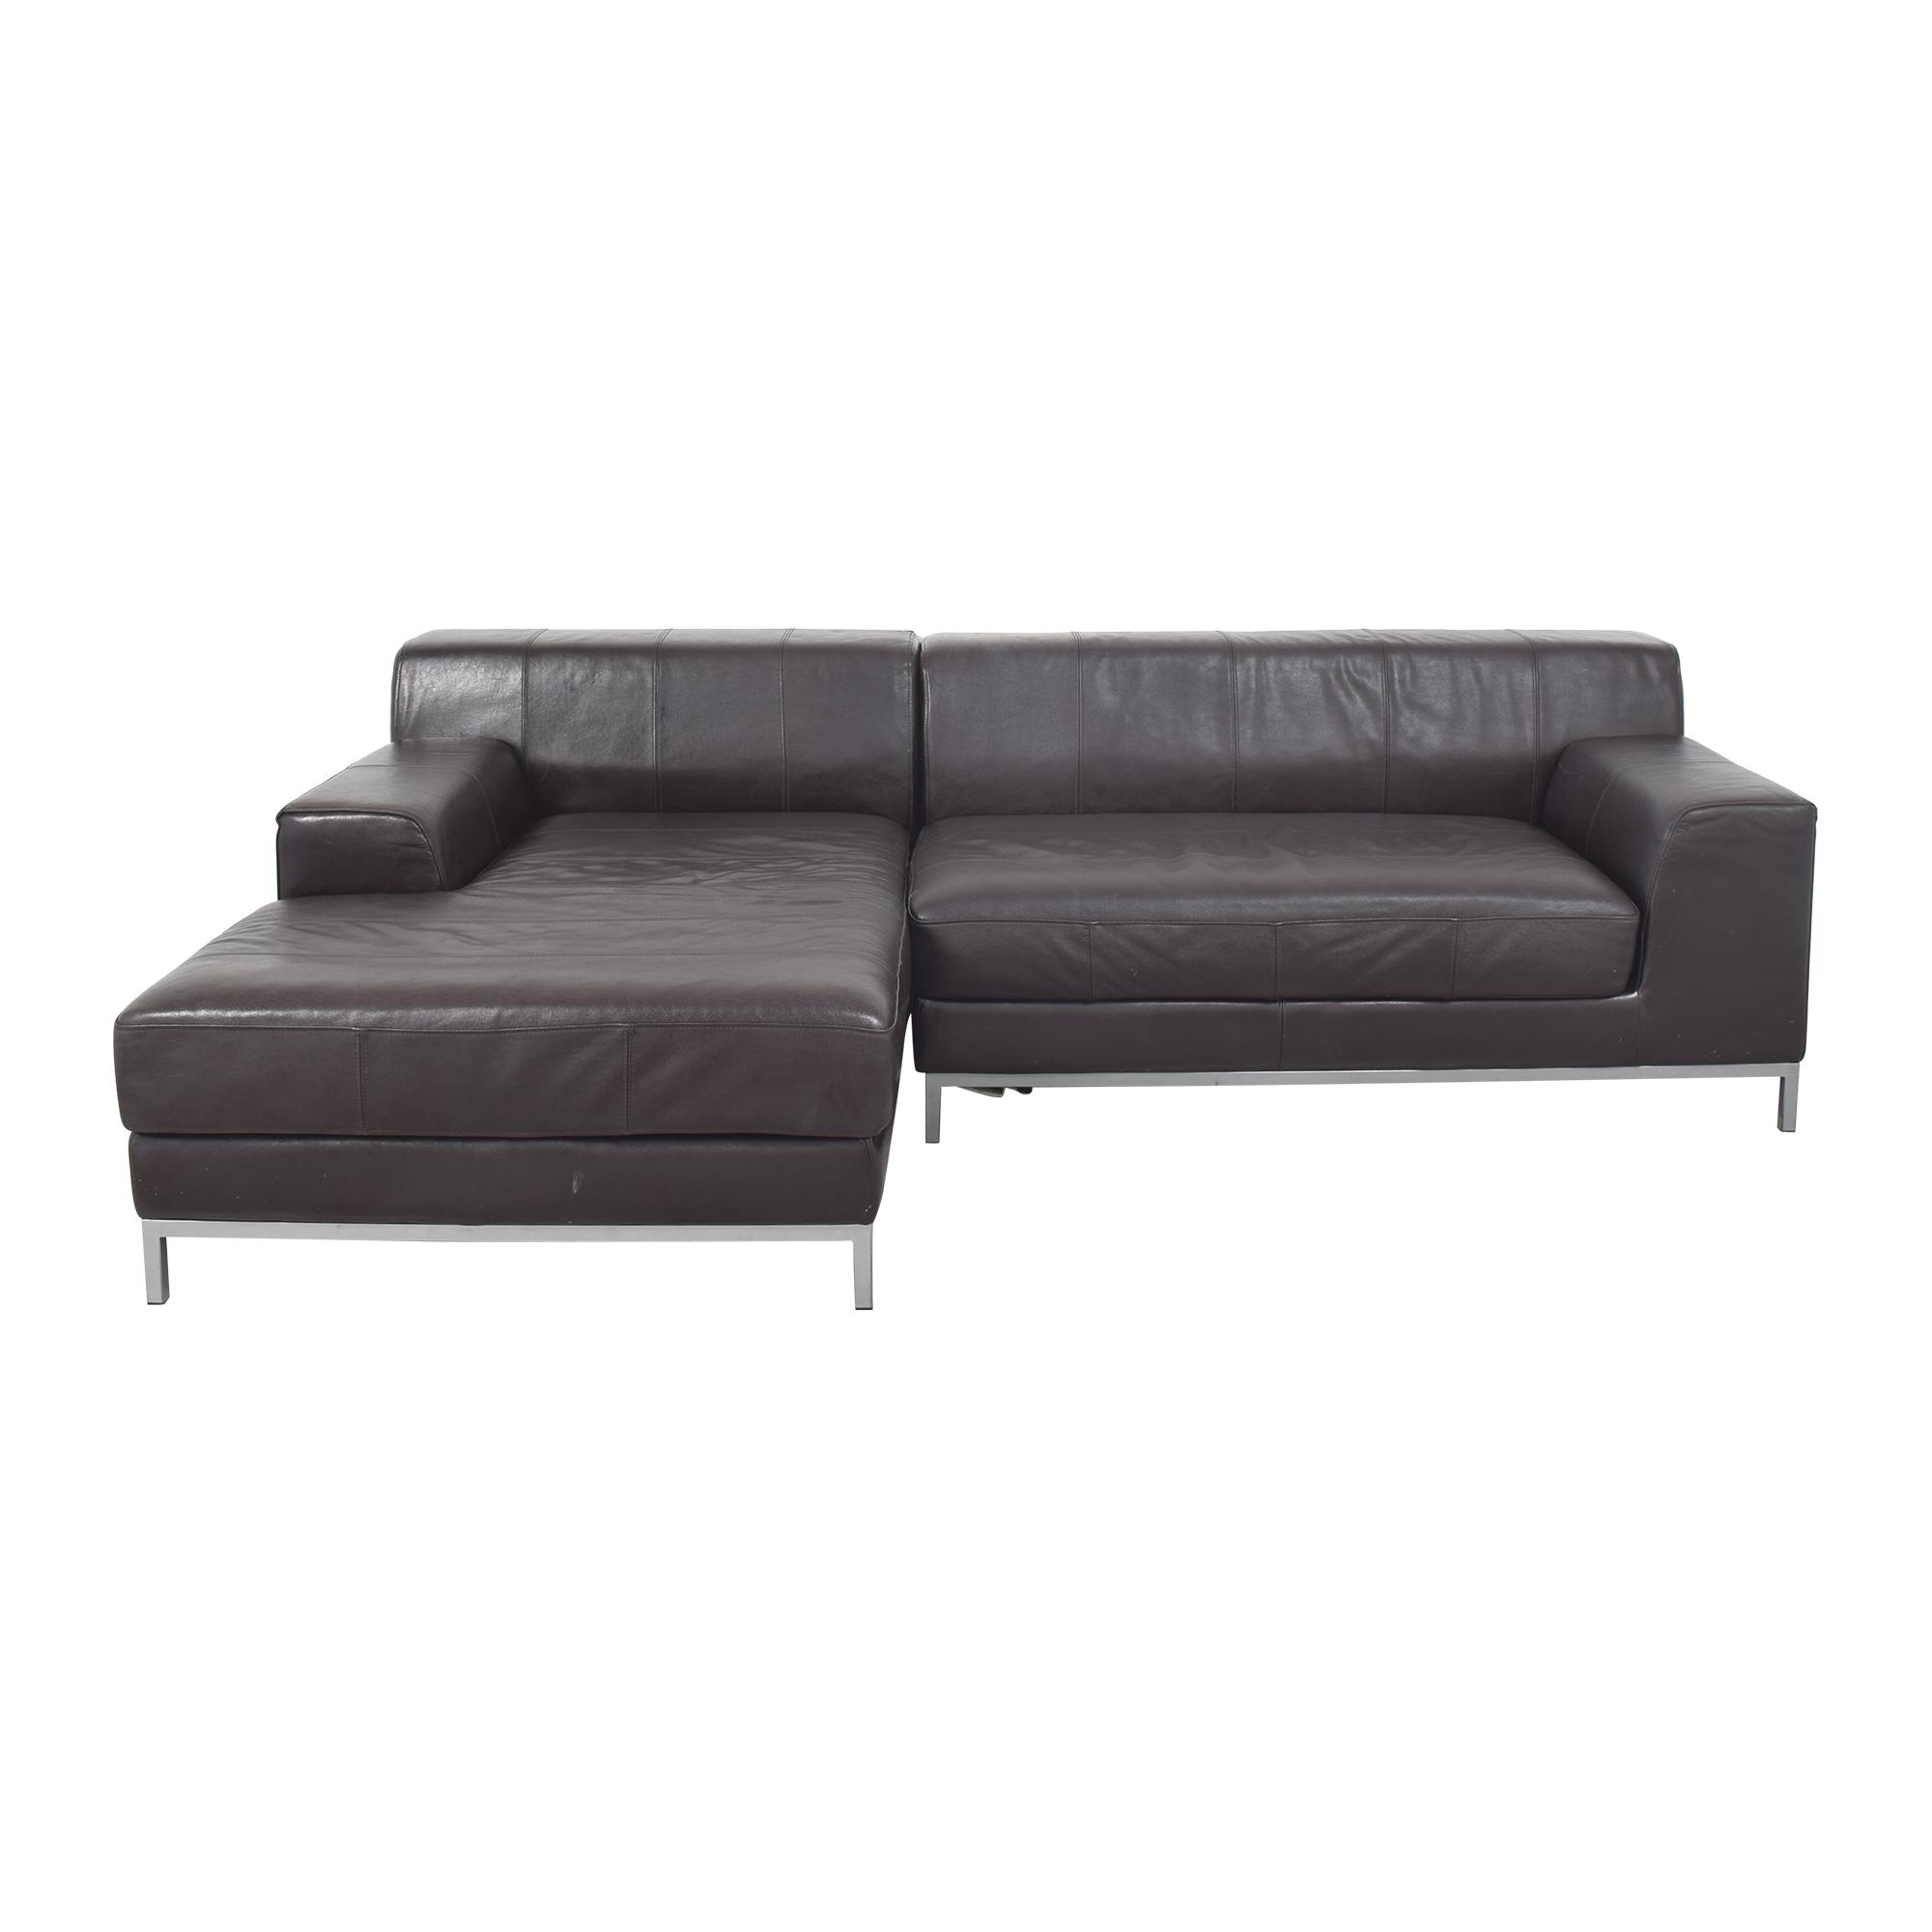 buy IKEA Two Piece Chaise Sectional Sofa IKEA